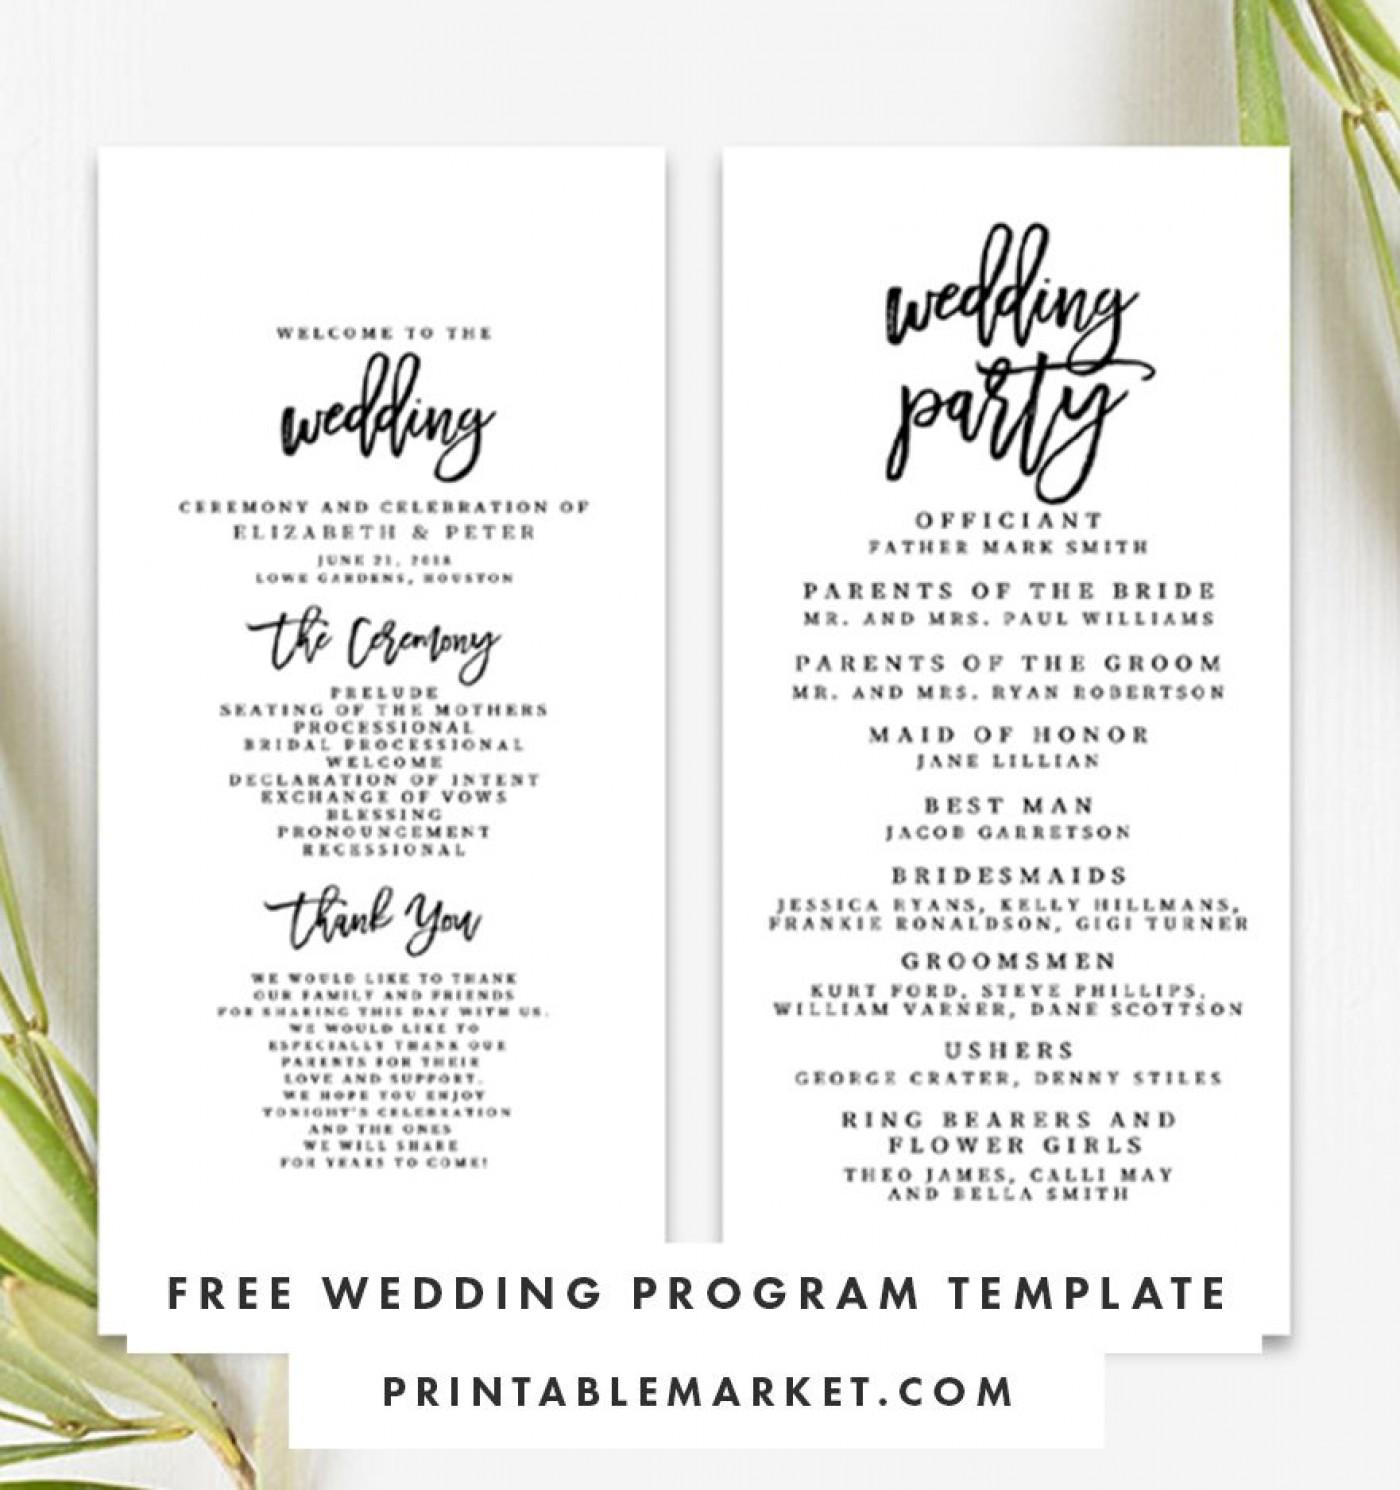 009 Striking Free Template For Wedding Ceremony Program Highest Quality 1400